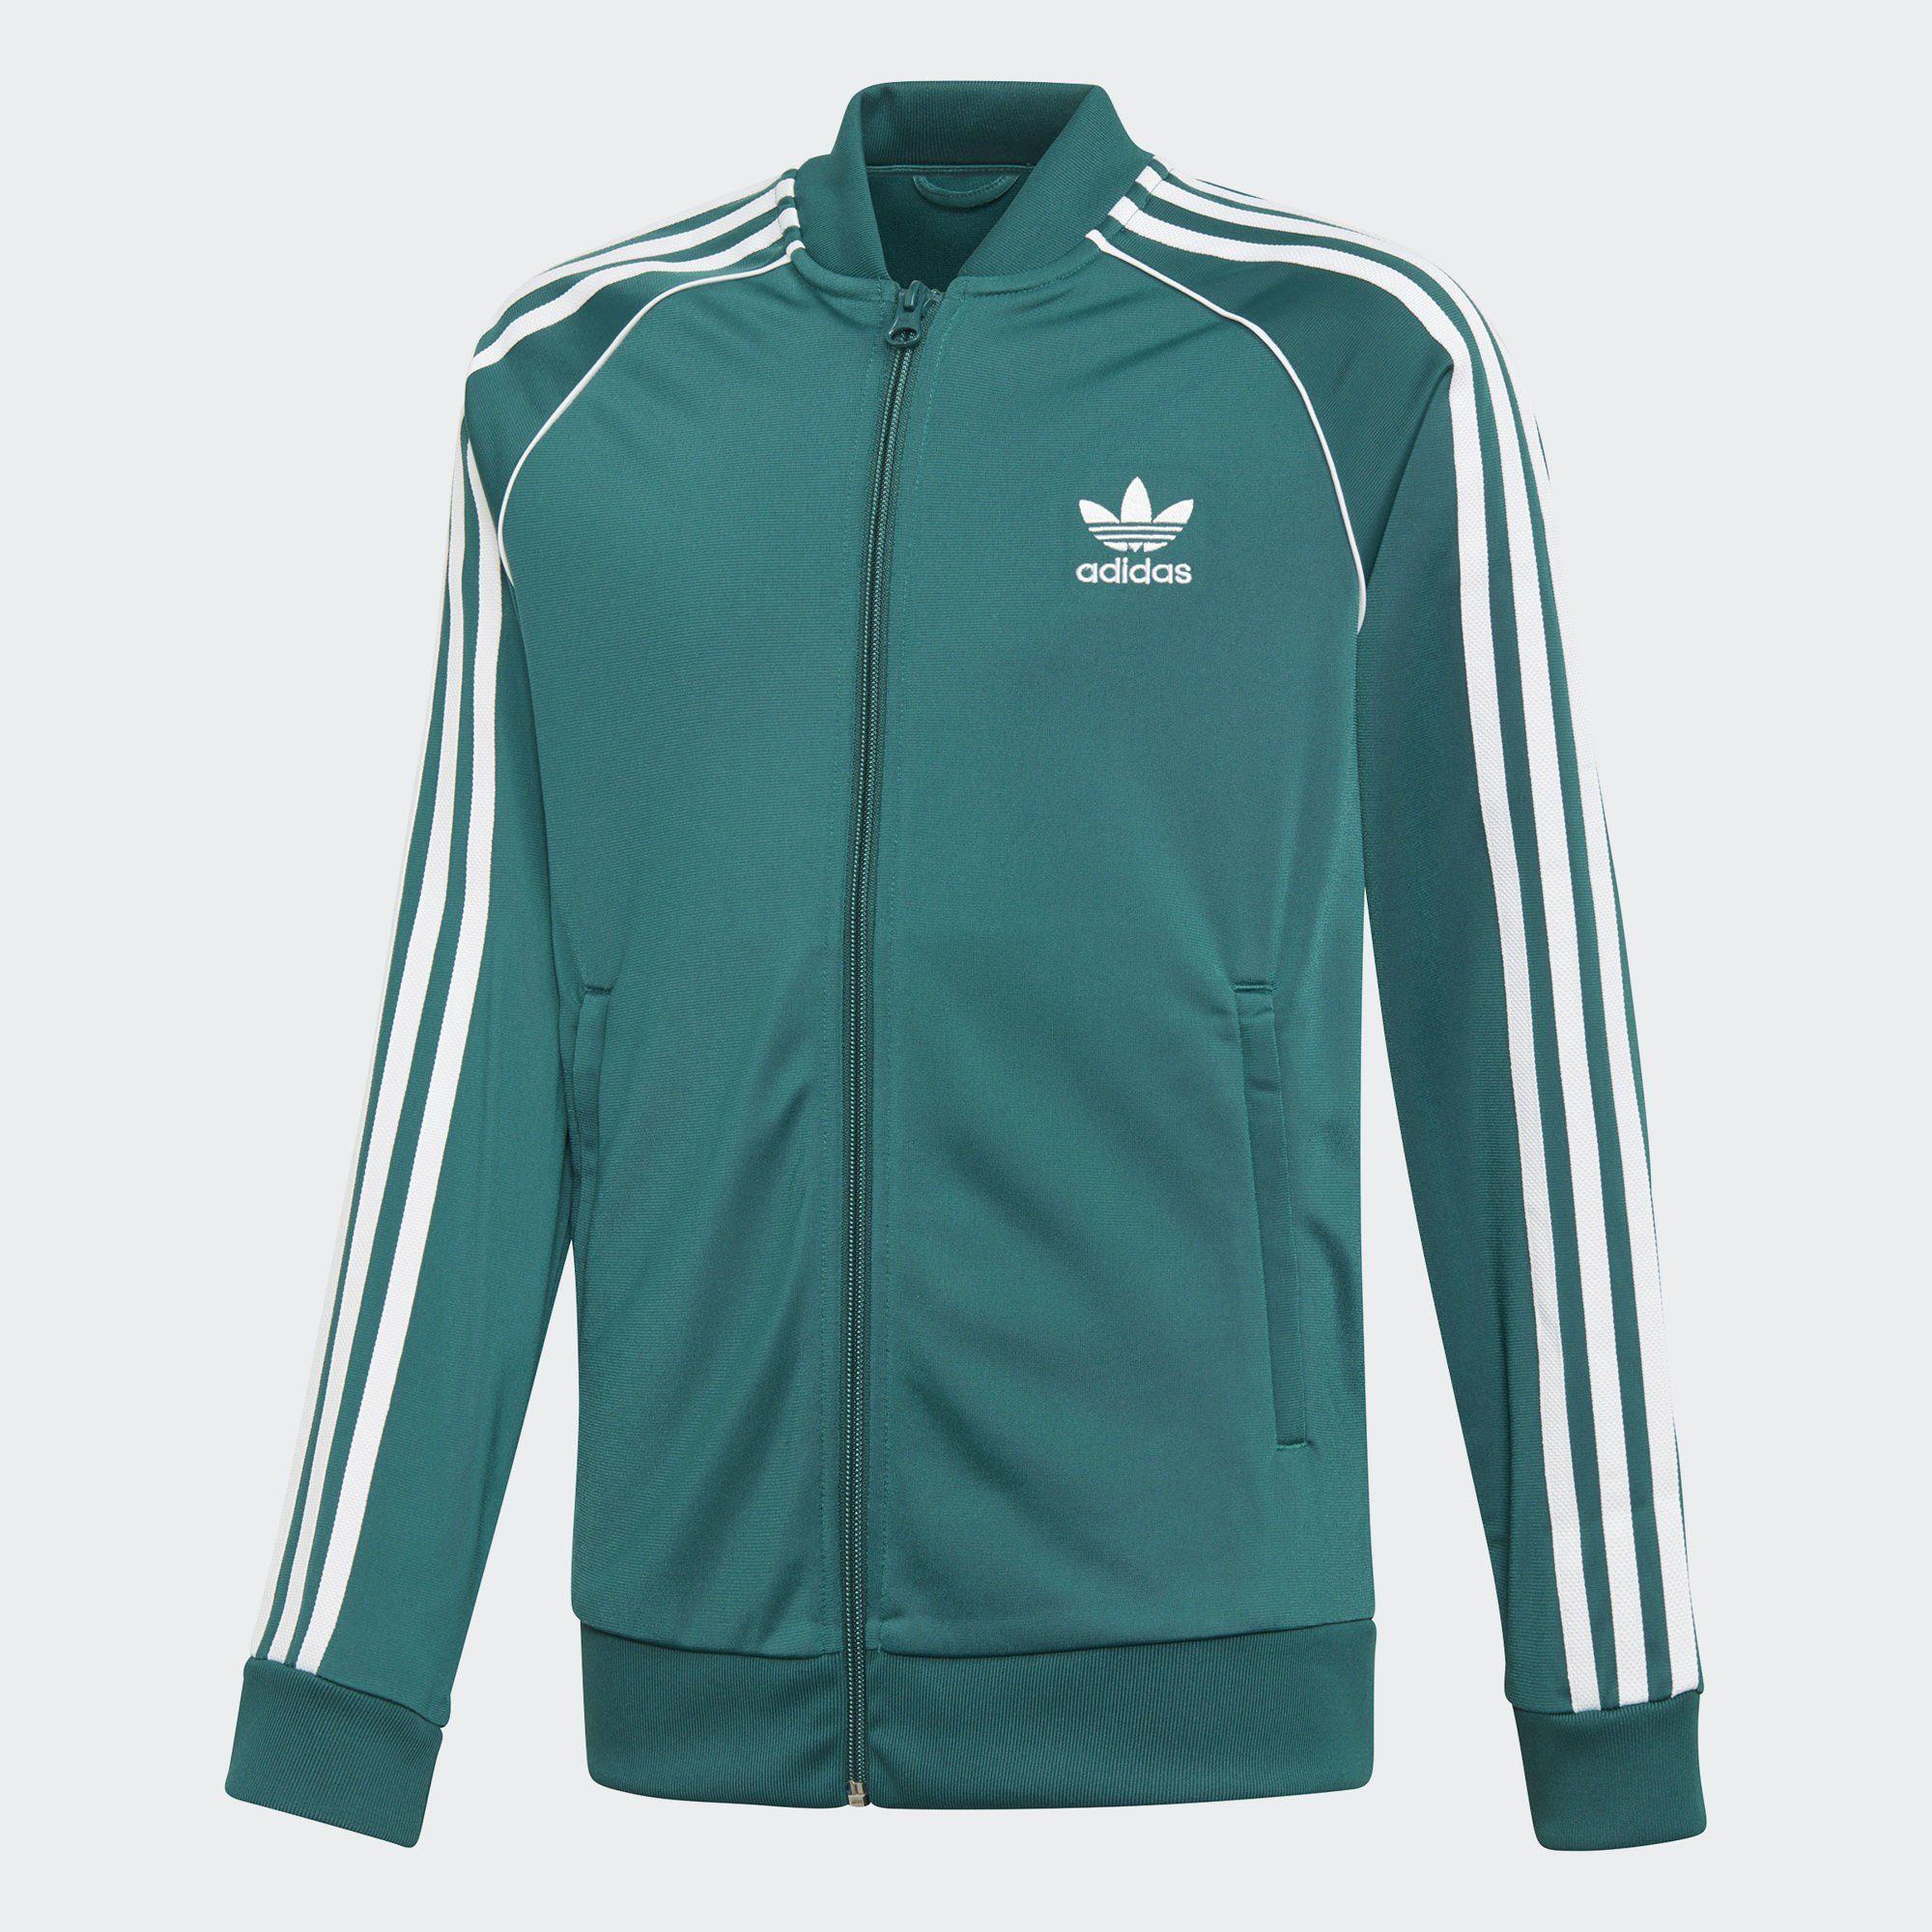 adidas Originals Trainingsanzug »SST Originals Jacke« online kaufen | OTTO